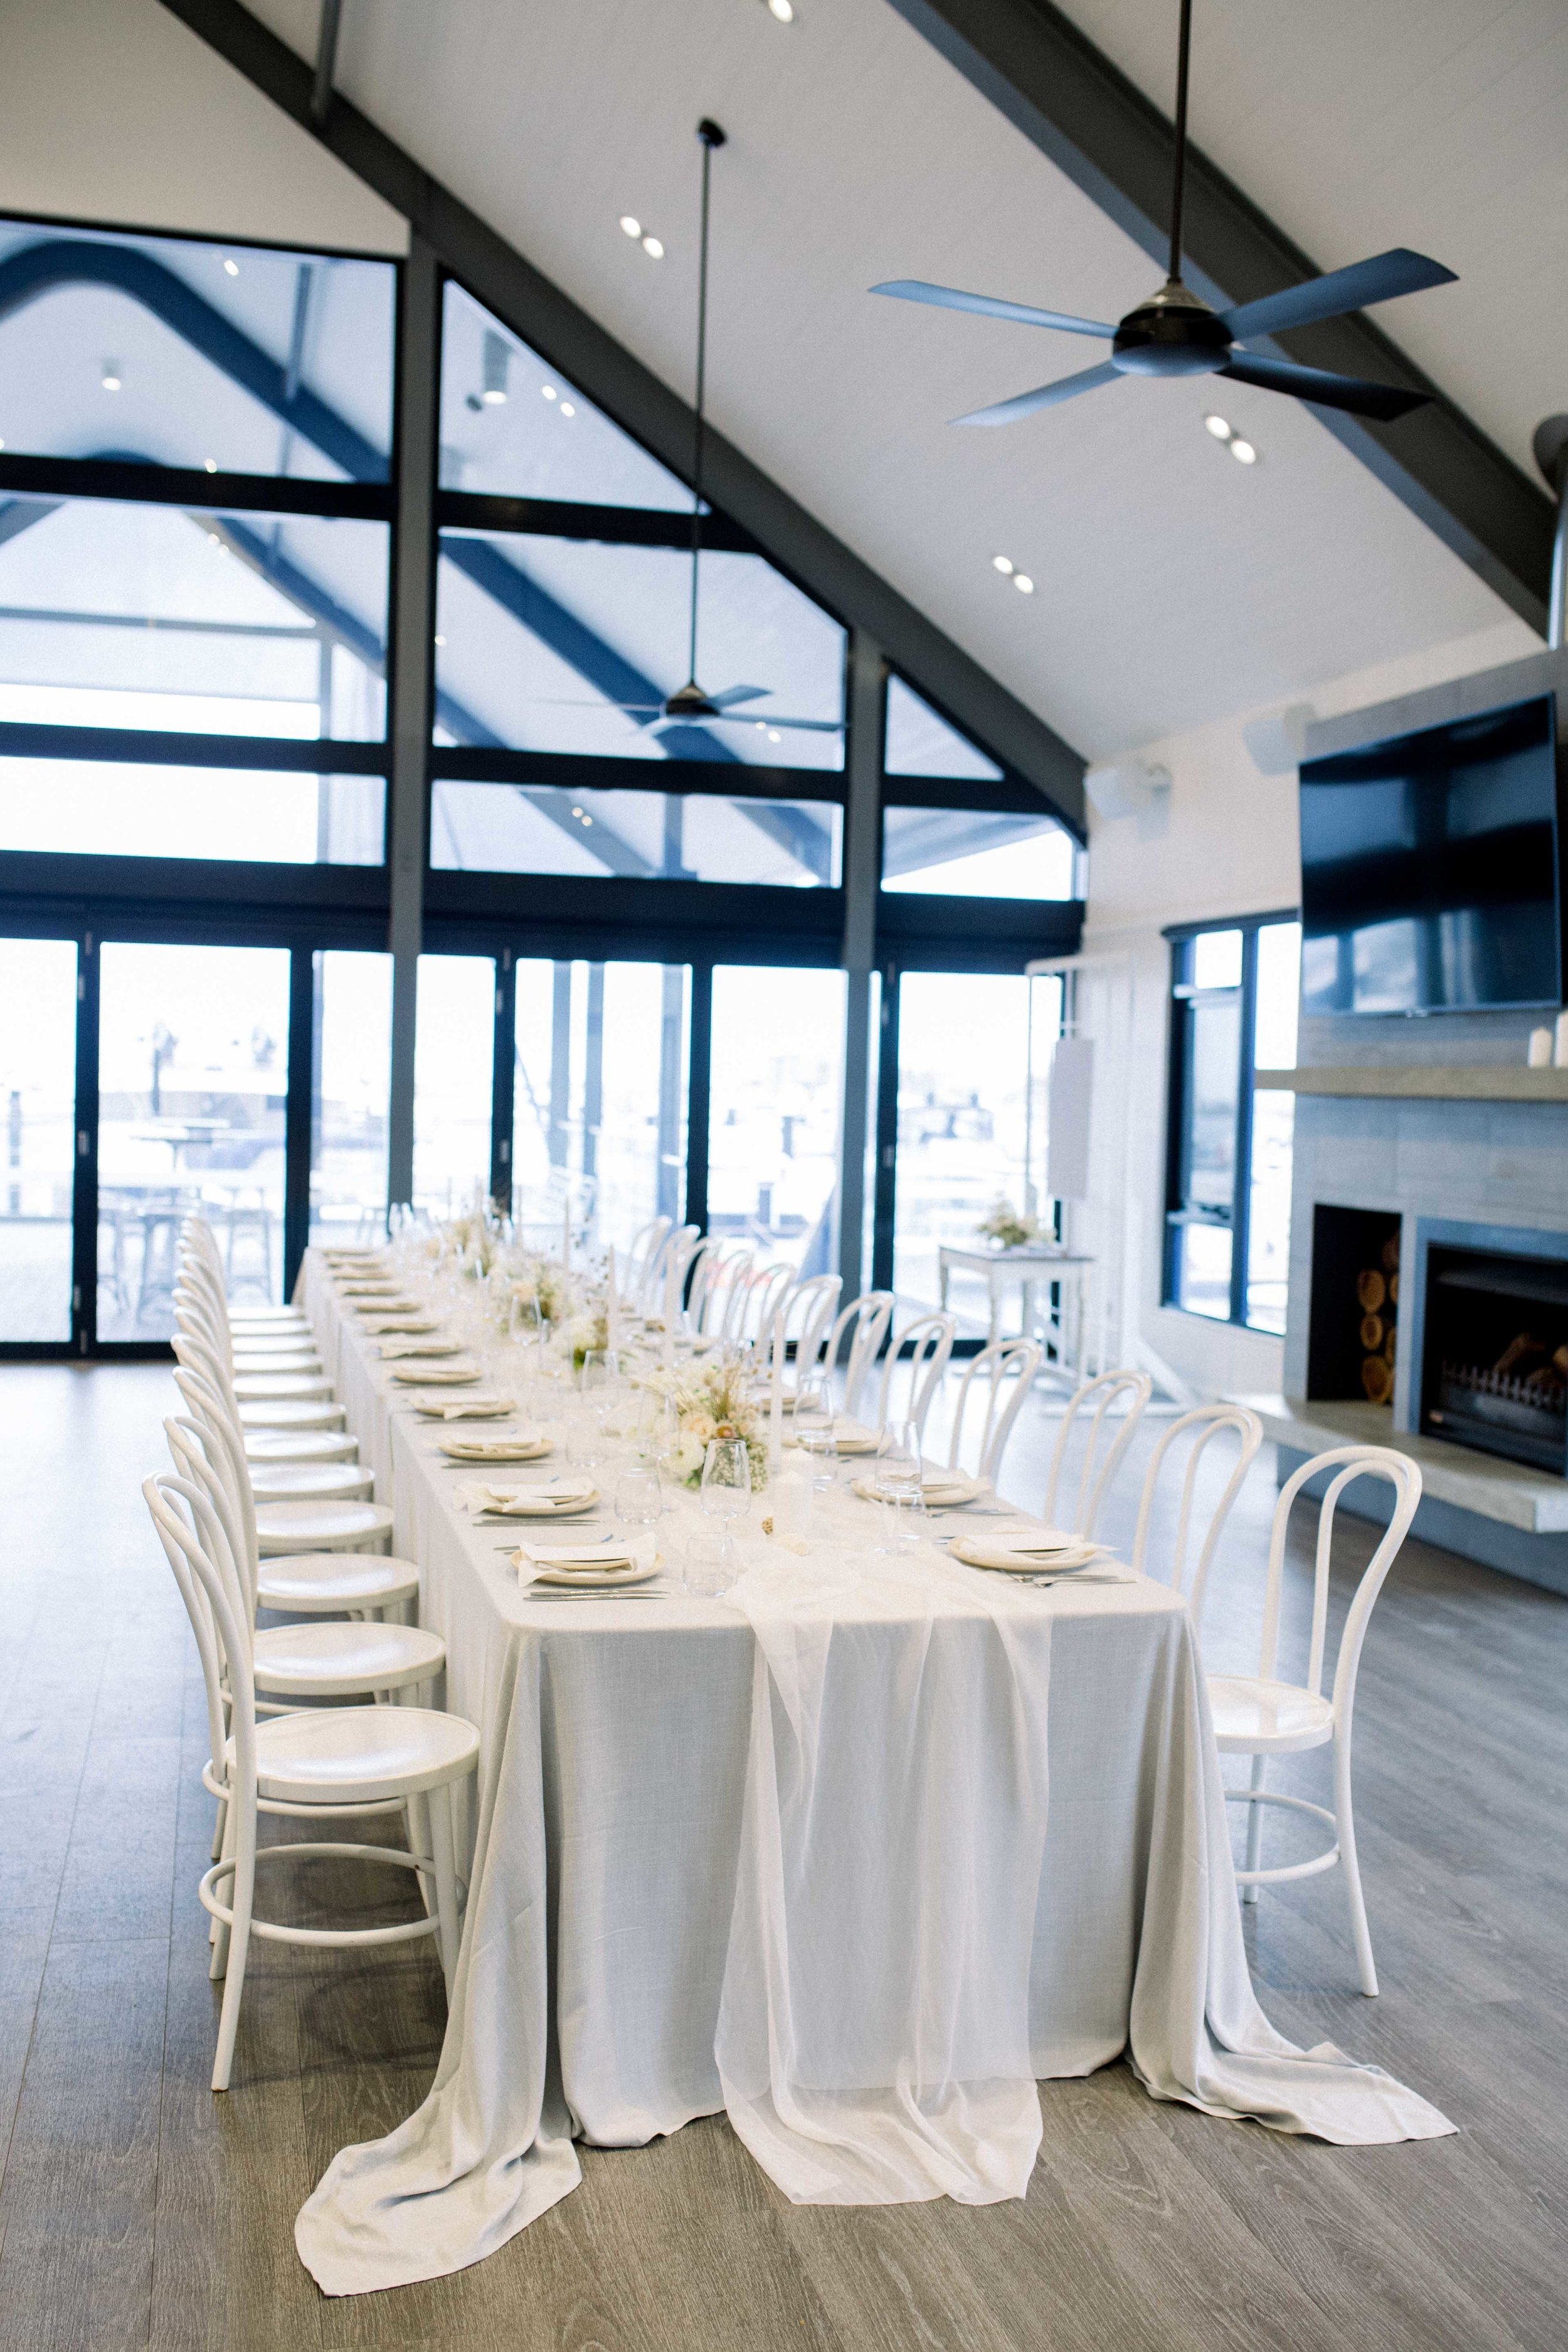 Fremantle Wedding Walk - Blue HQ, Perth Wedding Venue -  Tessa Kit Photography -JQ9A8517-Edit.jpg